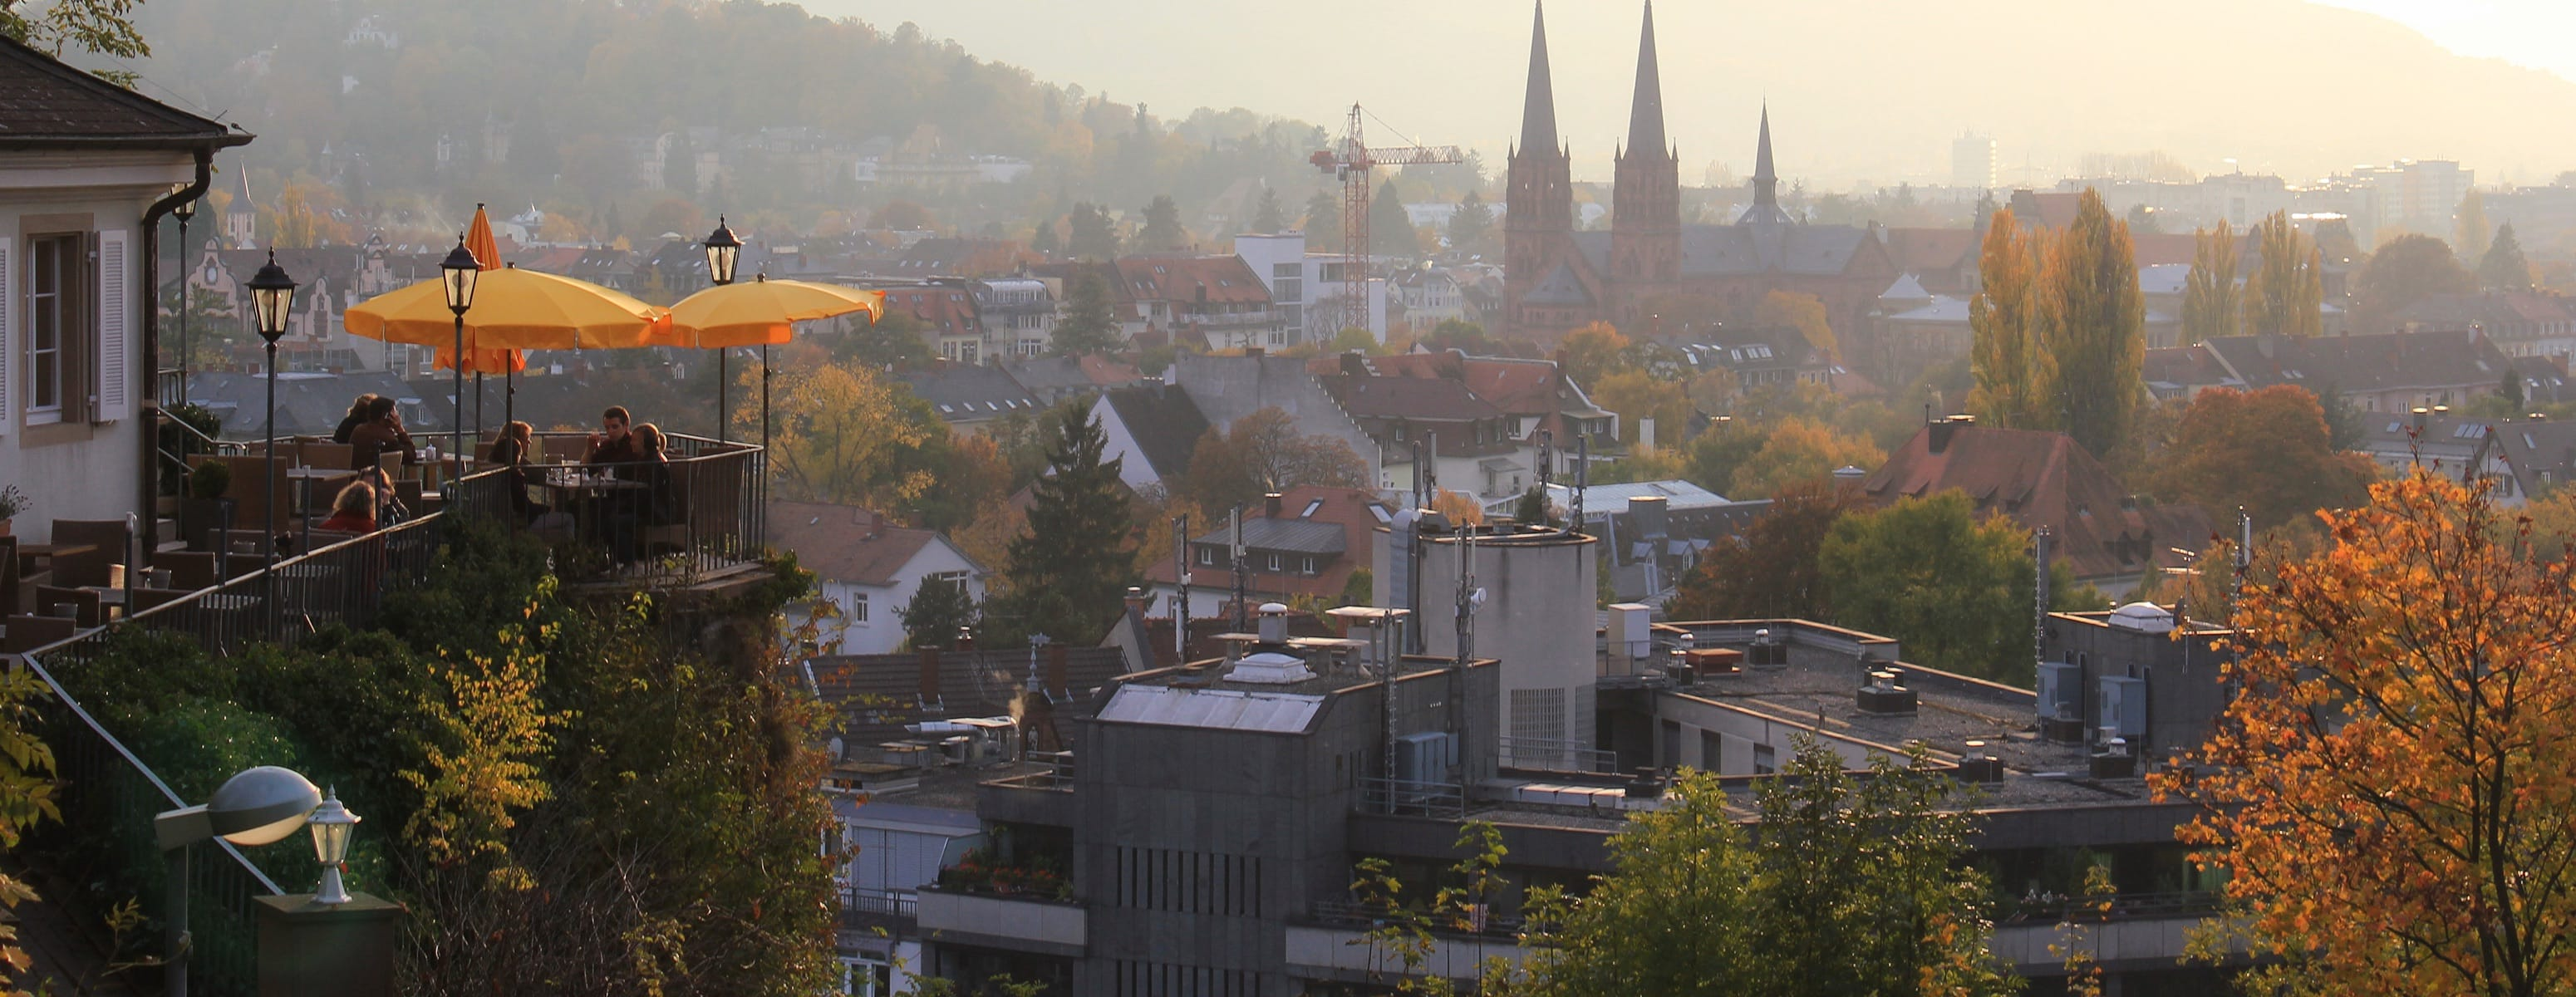 Www Hotel Freiburg De